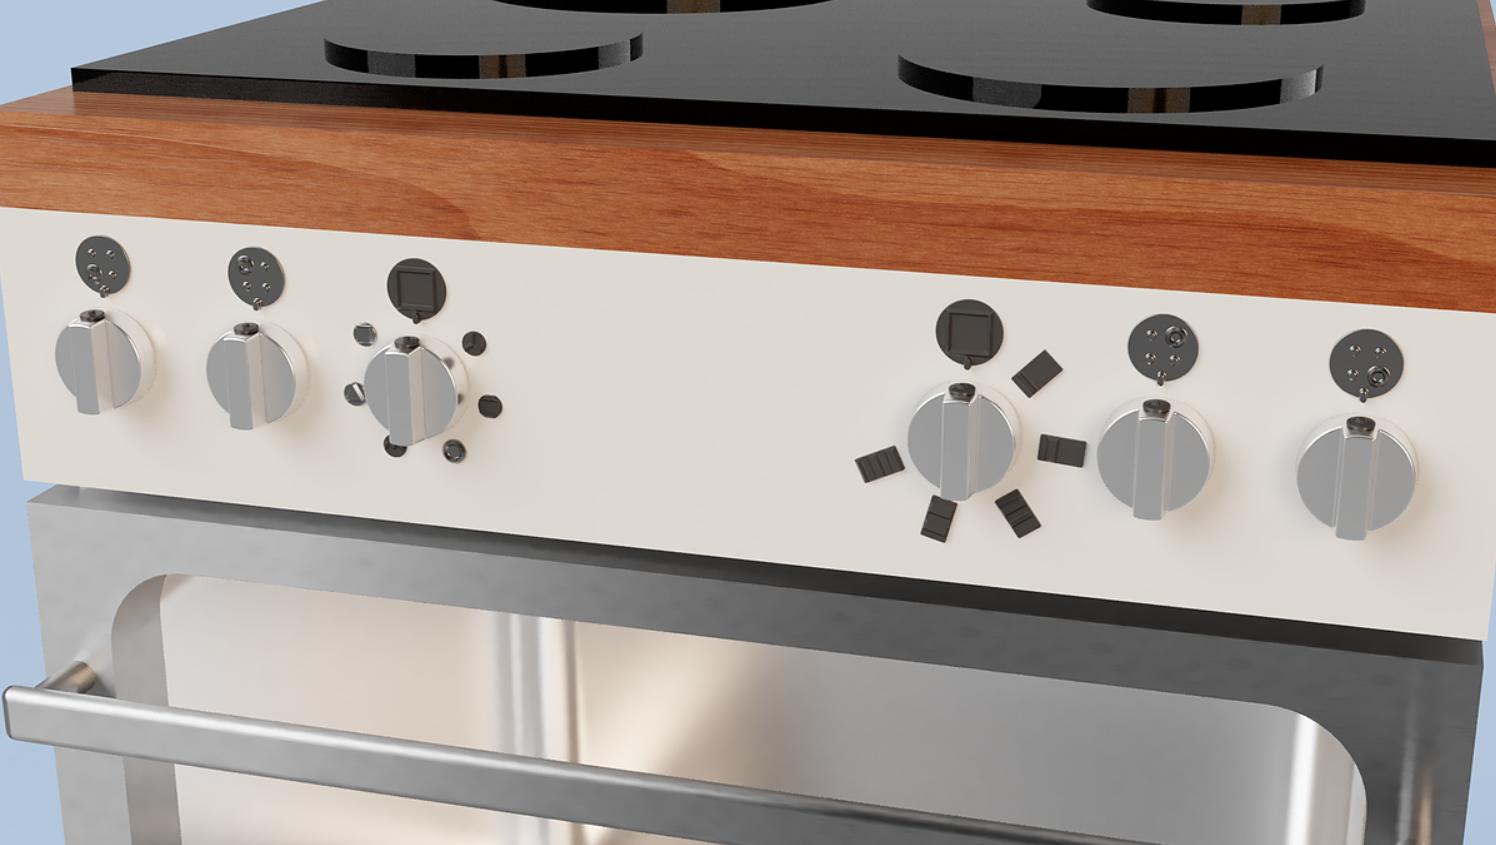 Feelware universele markering kookplaat